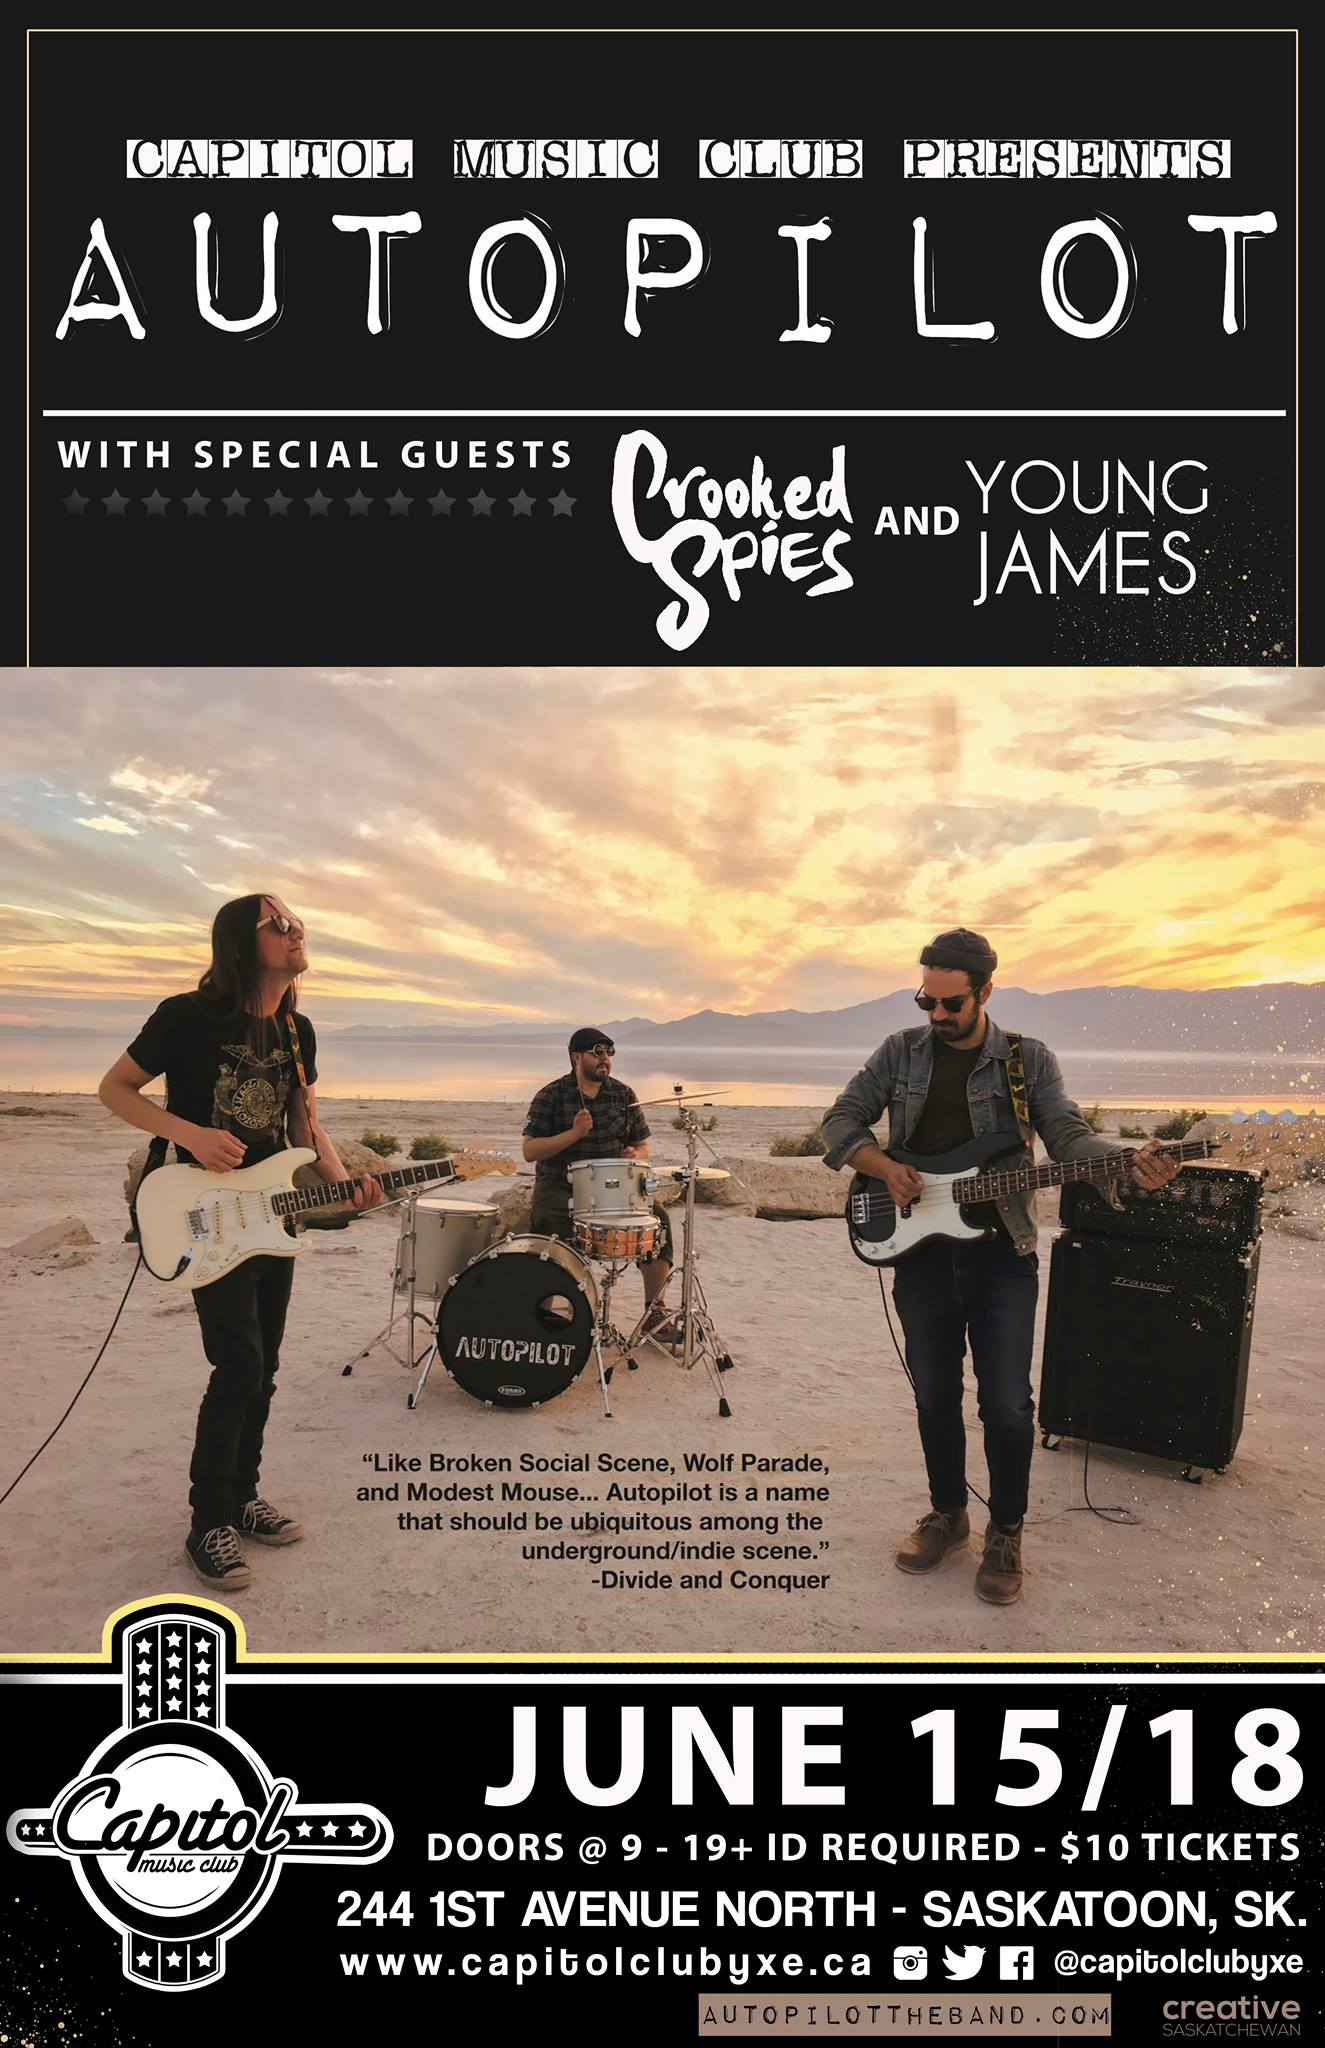 Friday, June 15 @ Capitol Music Club, Saskatoon, SK w/ Autopilot & Young James -